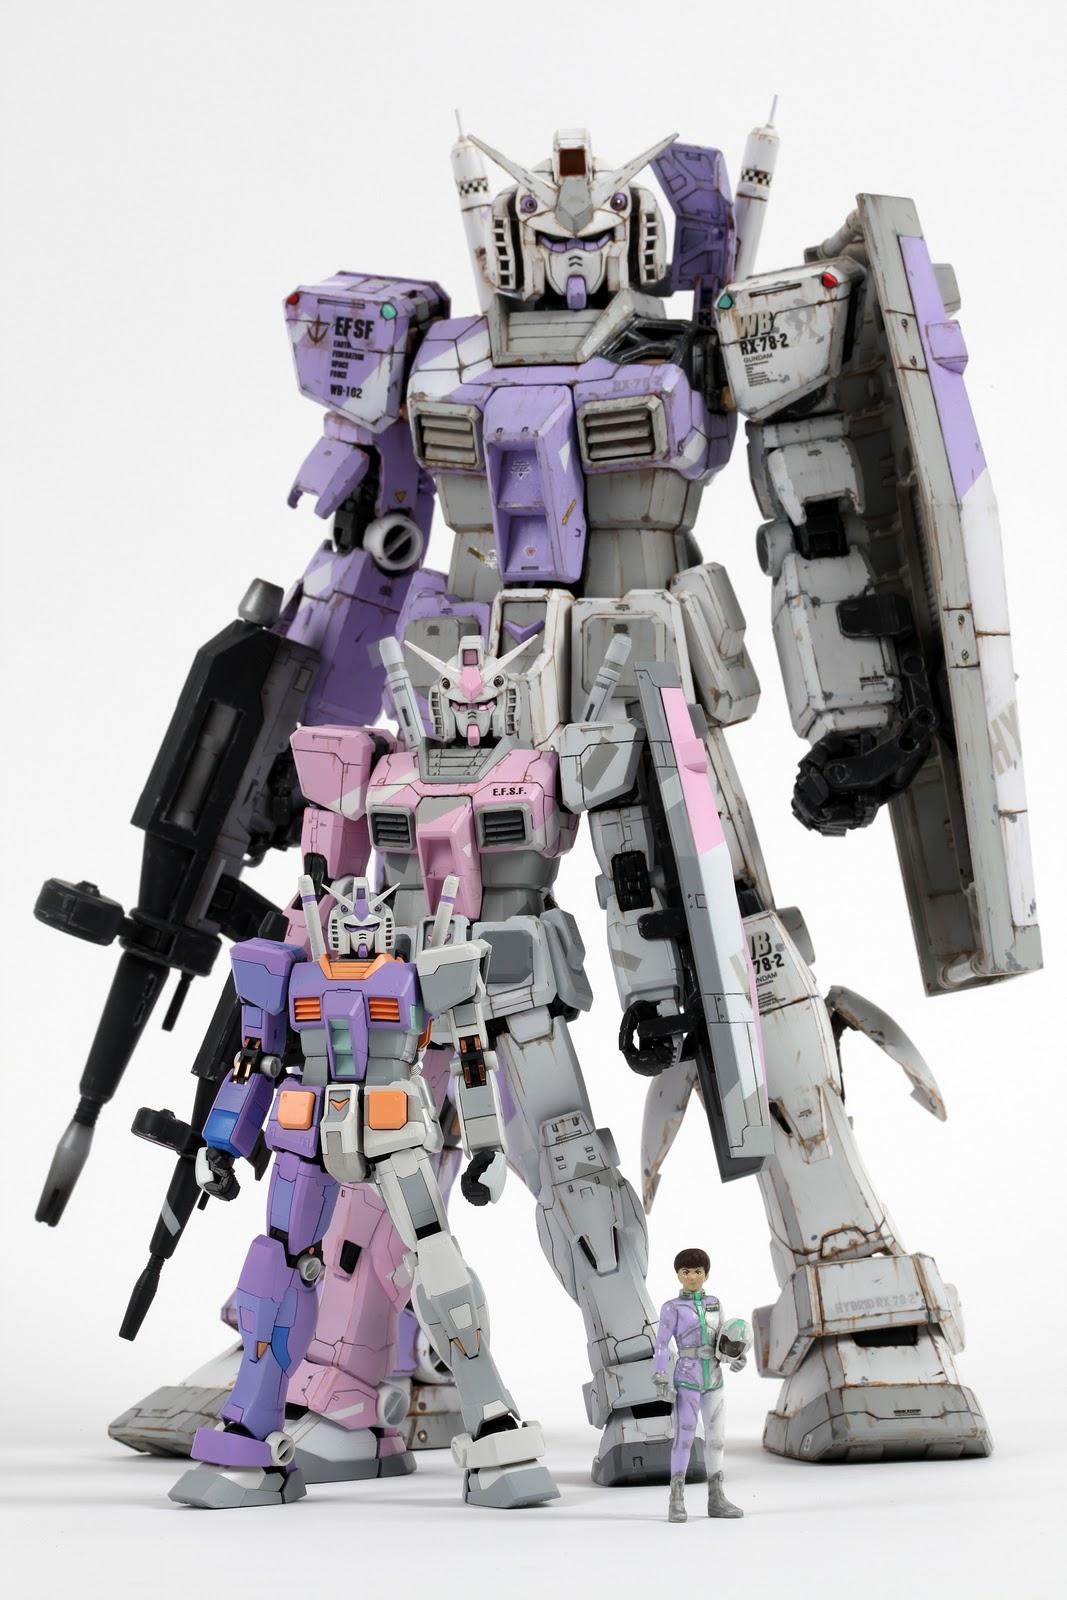 SoriFactory: All Hybrid Gundam RX-78-2